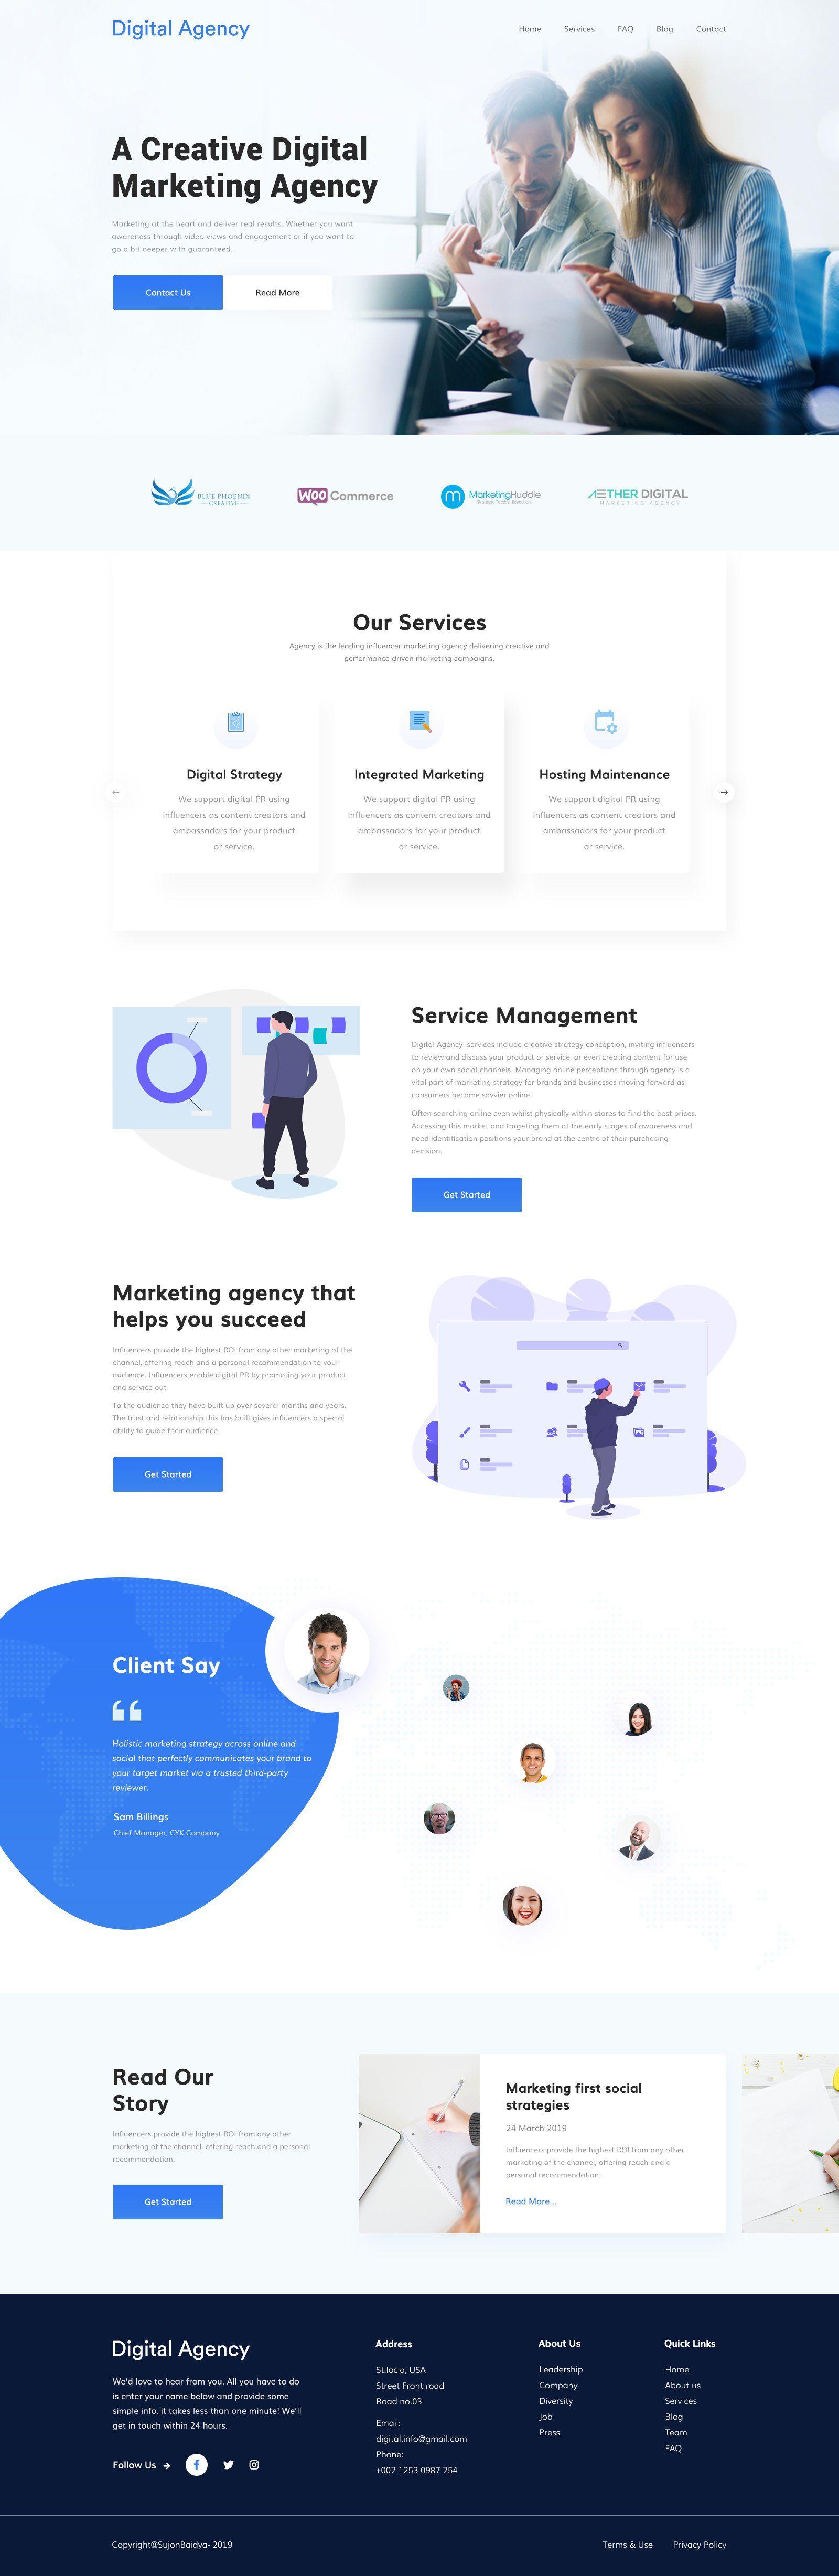 Digital Marketing Agency Corporate Website Design Modern Website Design Digital Marketing Agency